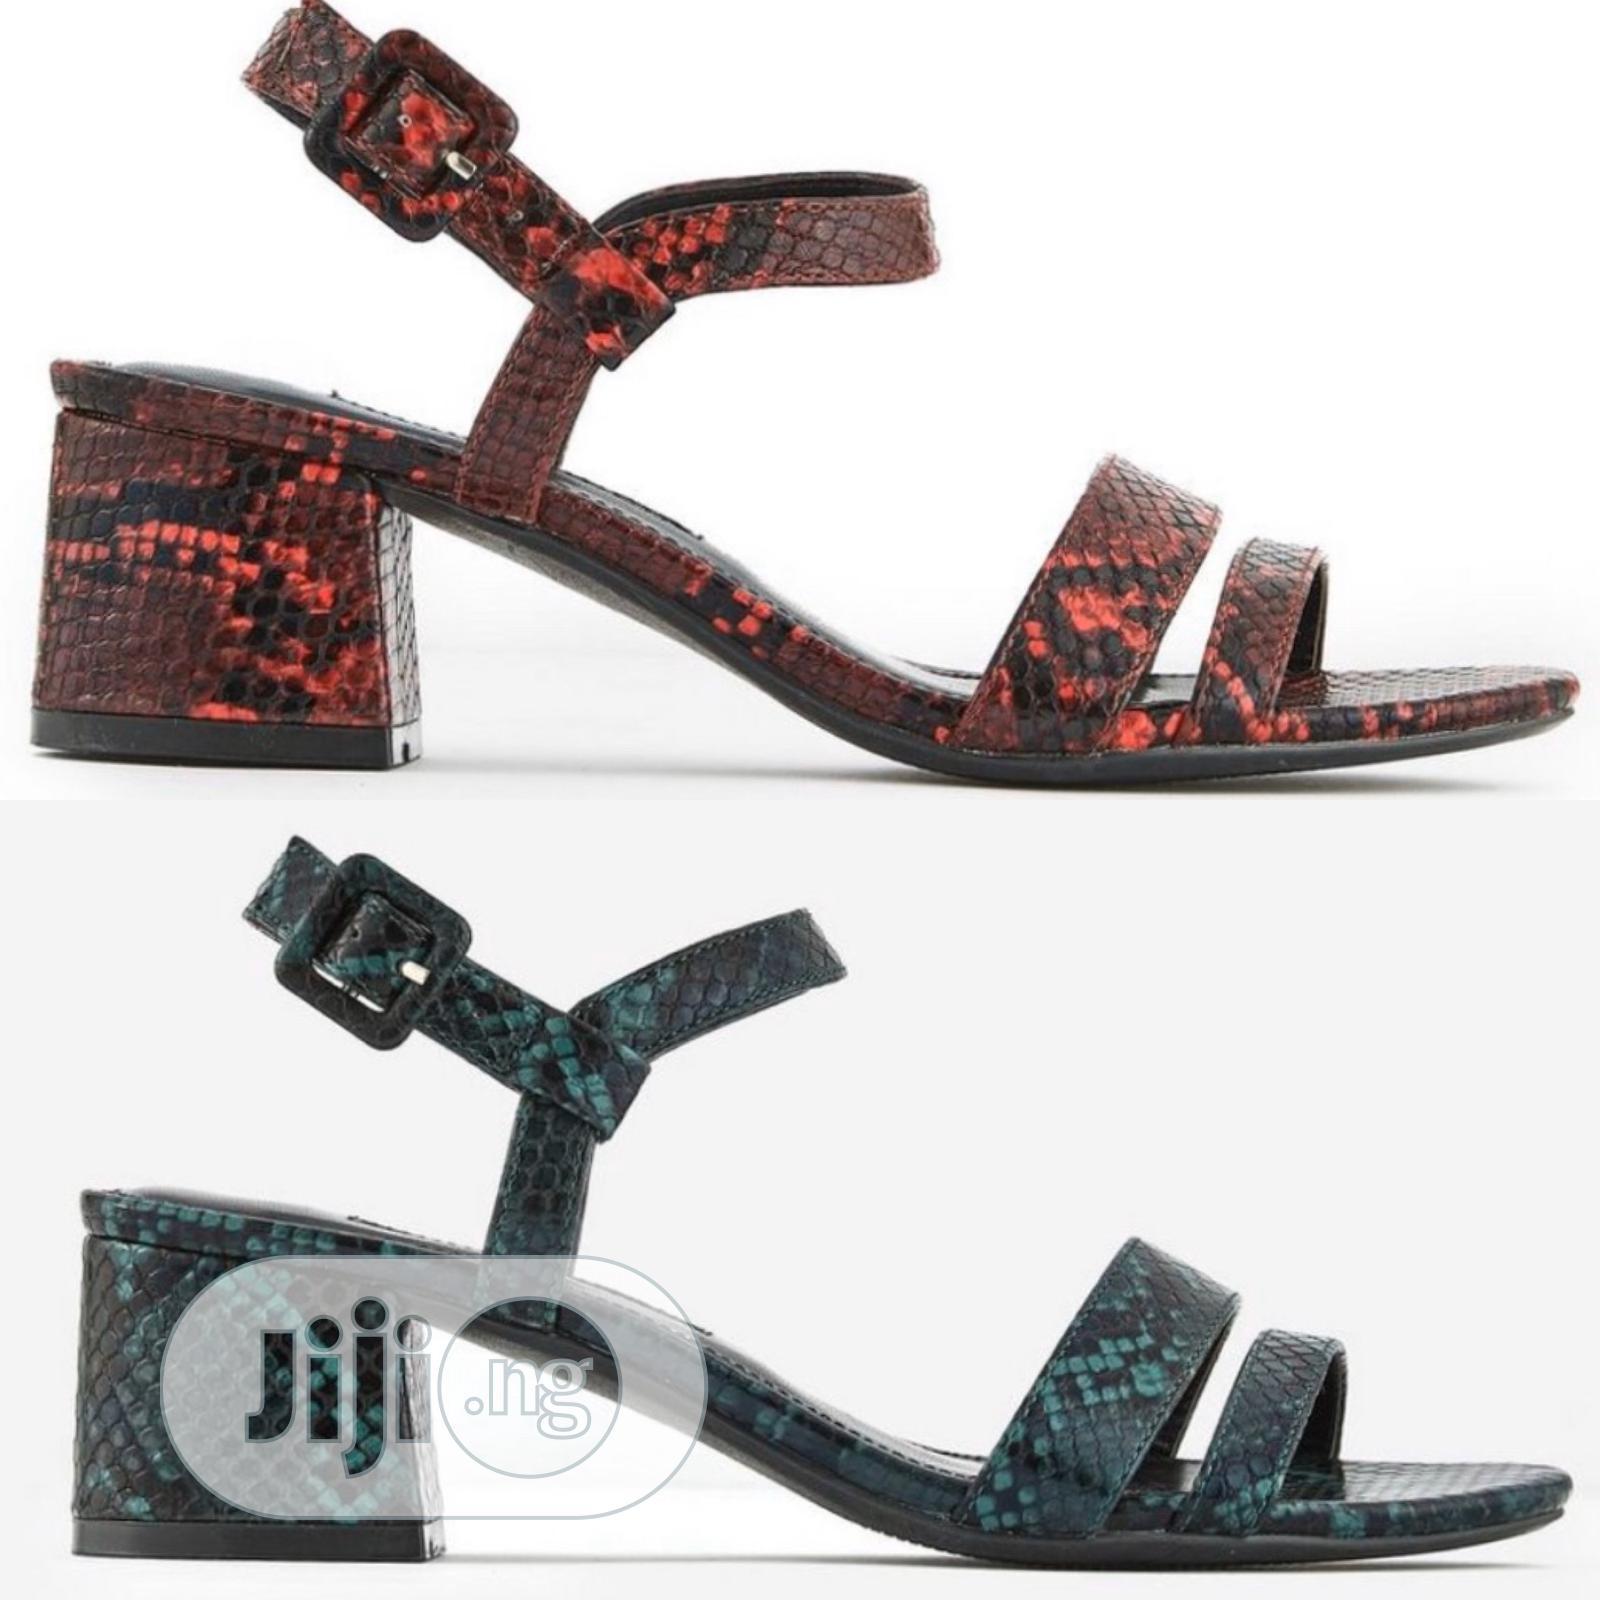 Block Mid Heel Sandals in Wine or Green Animal Skin